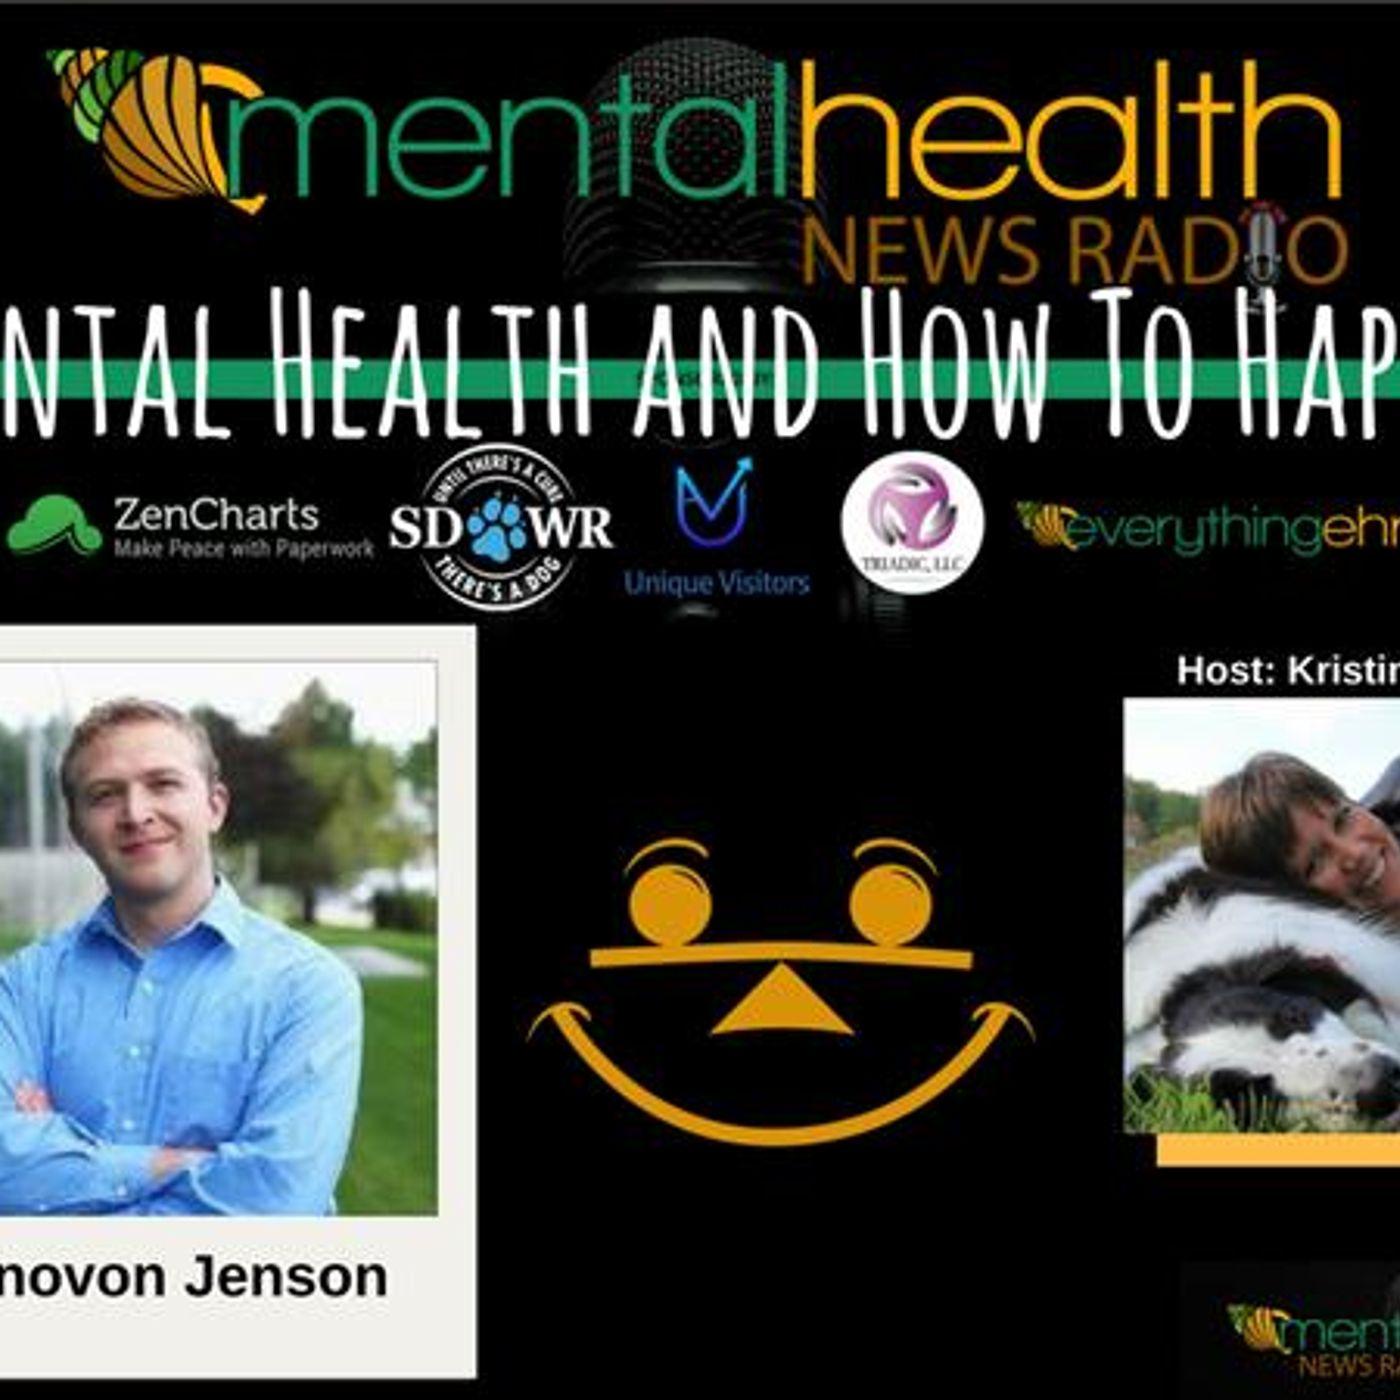 Mental Health News Radio - Mental Health and How To Happy with Donovon Jenson